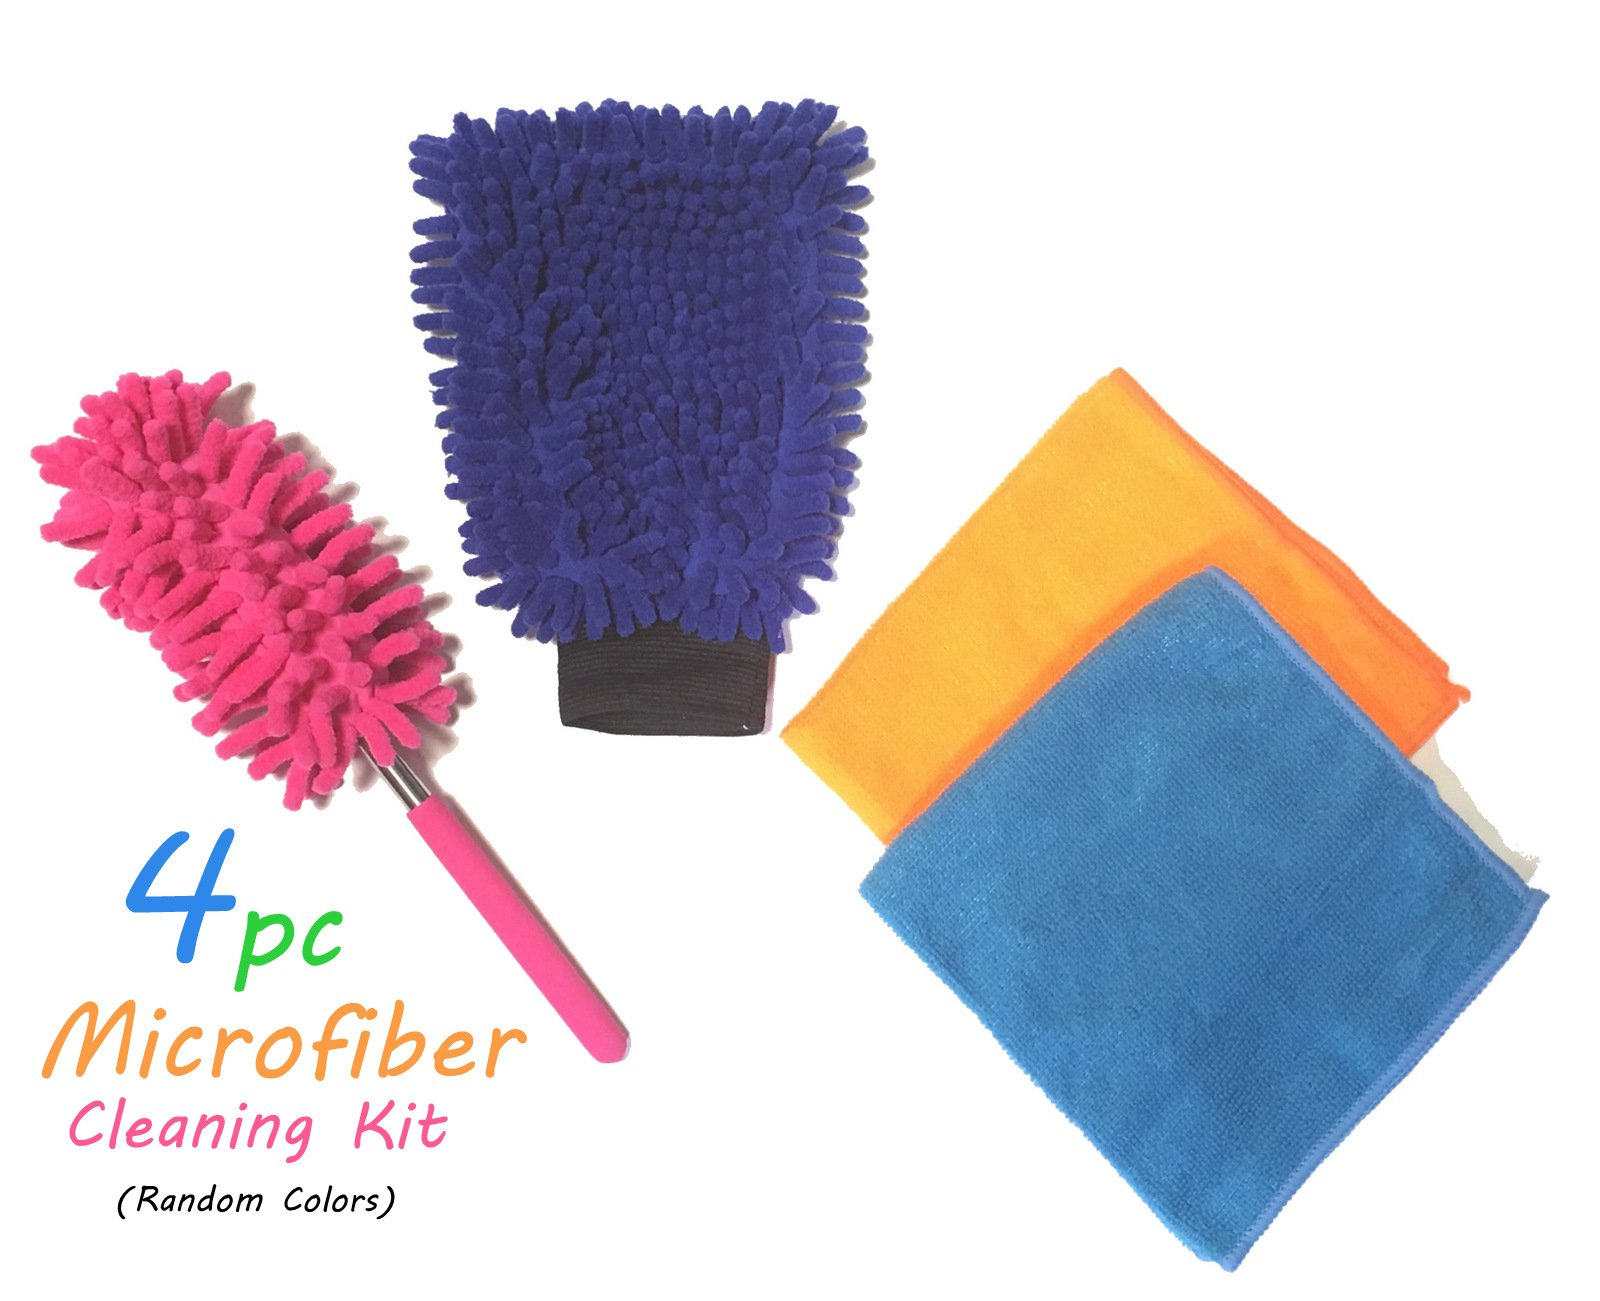 4pc Azi Microfiber Cleaning Kit - Dusting Windows Kitchen Bathroom Mirrors Car Electronics